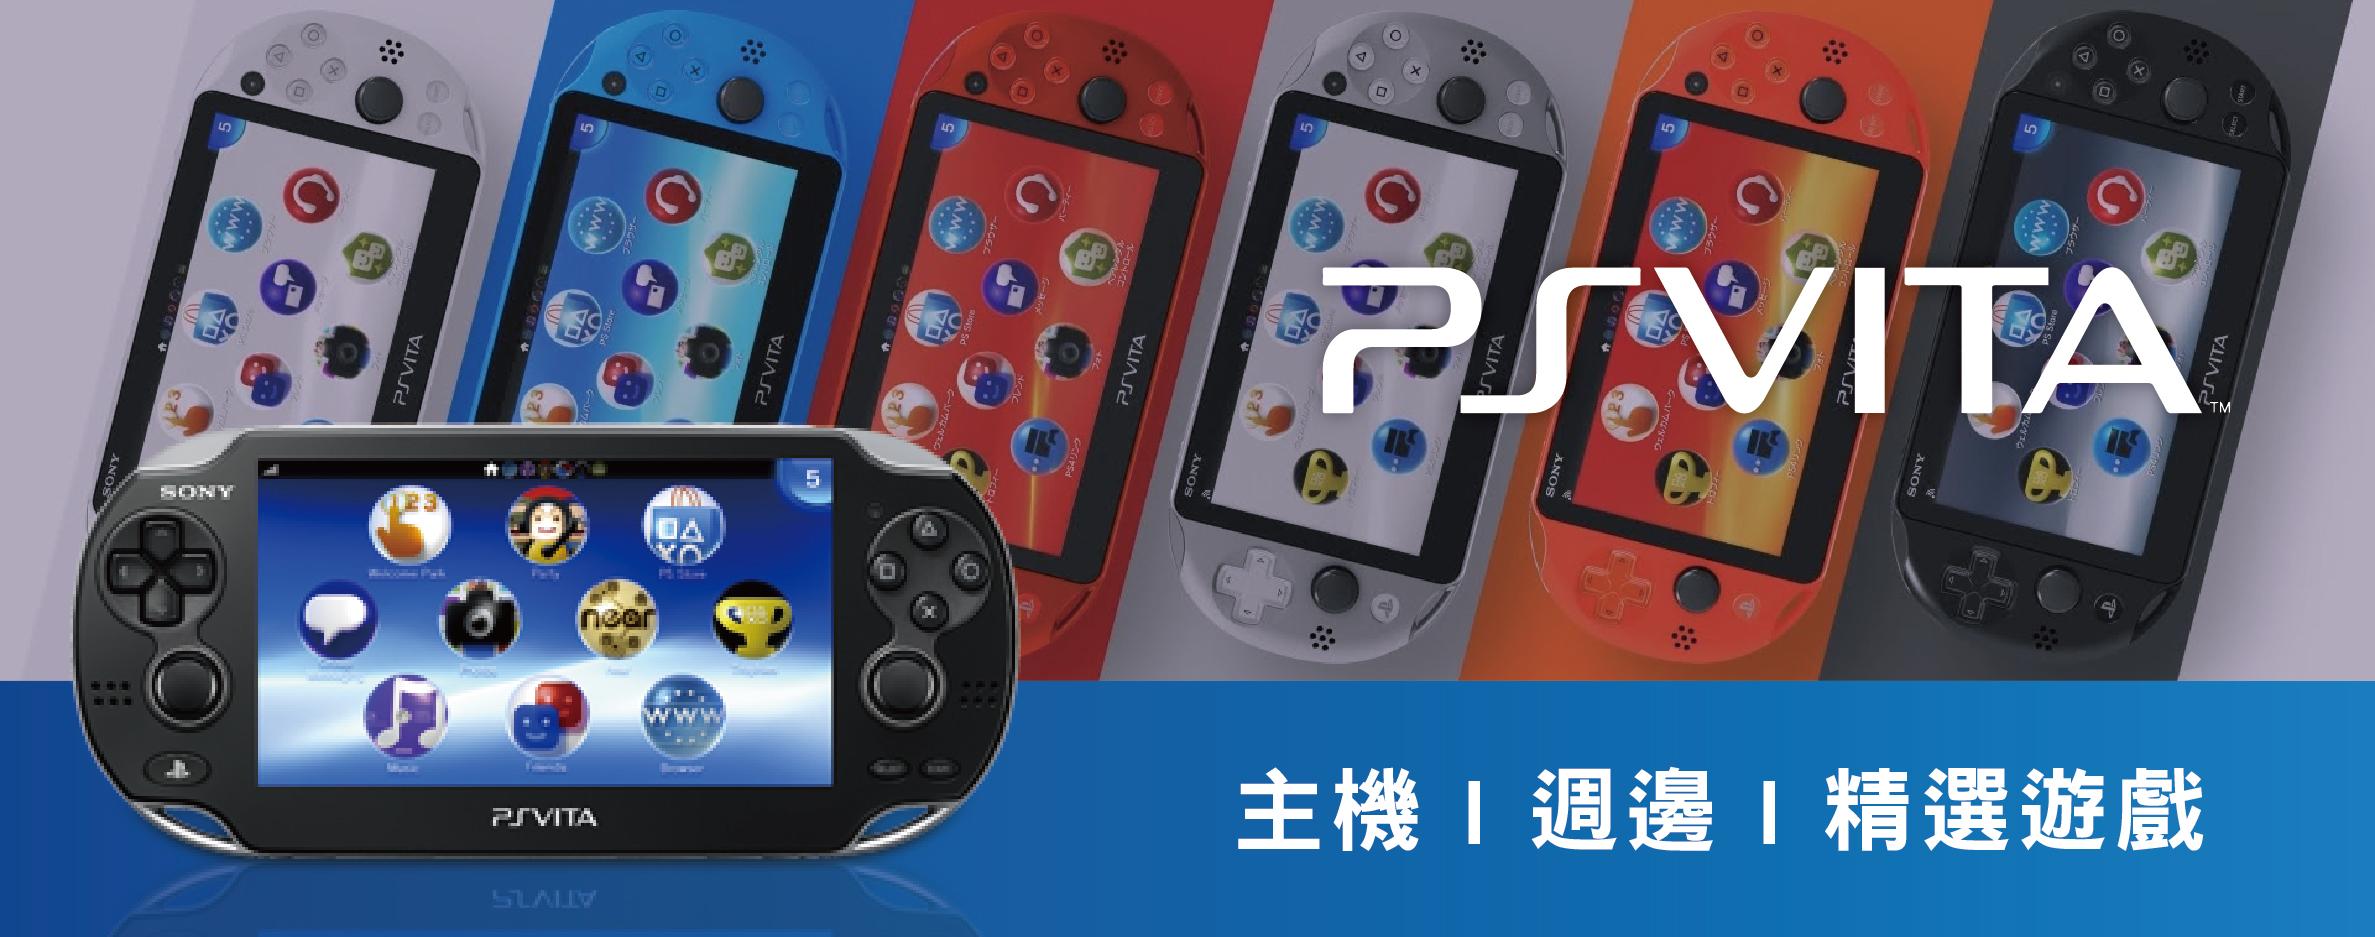 PSVITA 週邊/遊戲 - 茶米電玩品牌名店